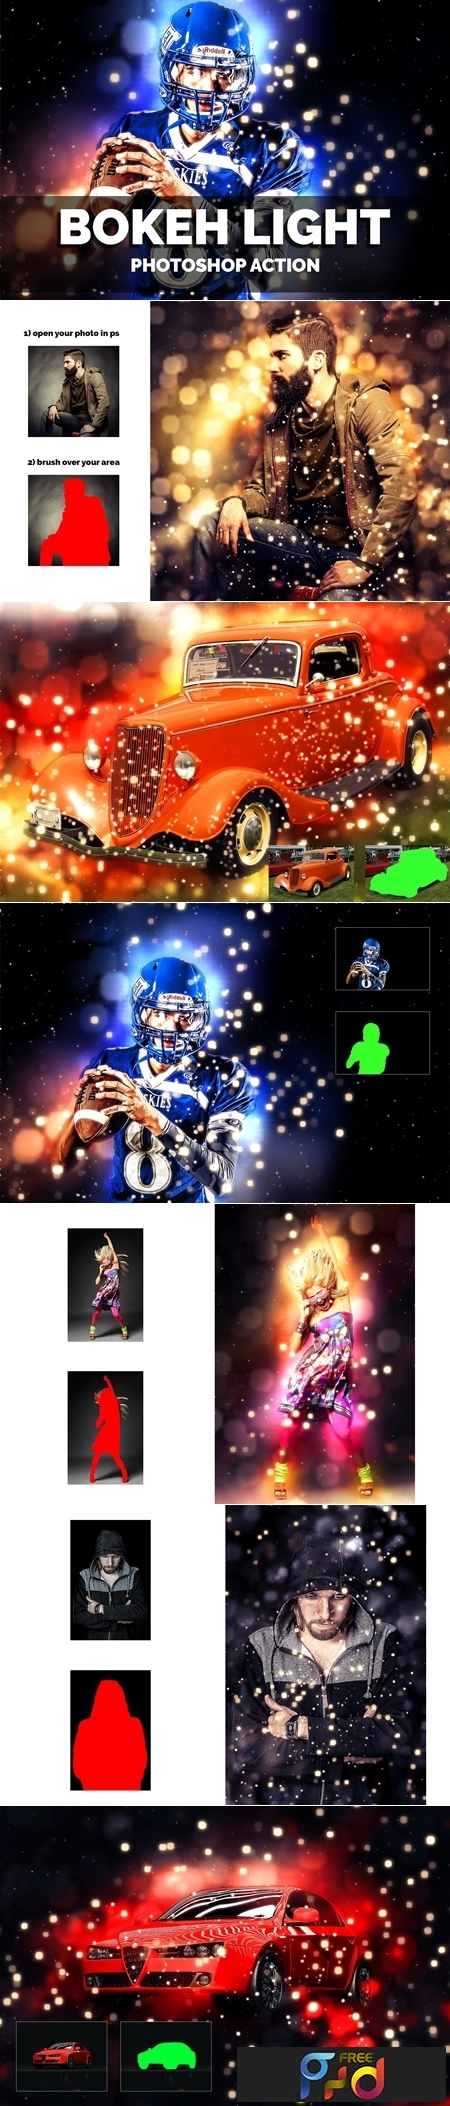 Bokeh Light Photoshop Action 3645453 1